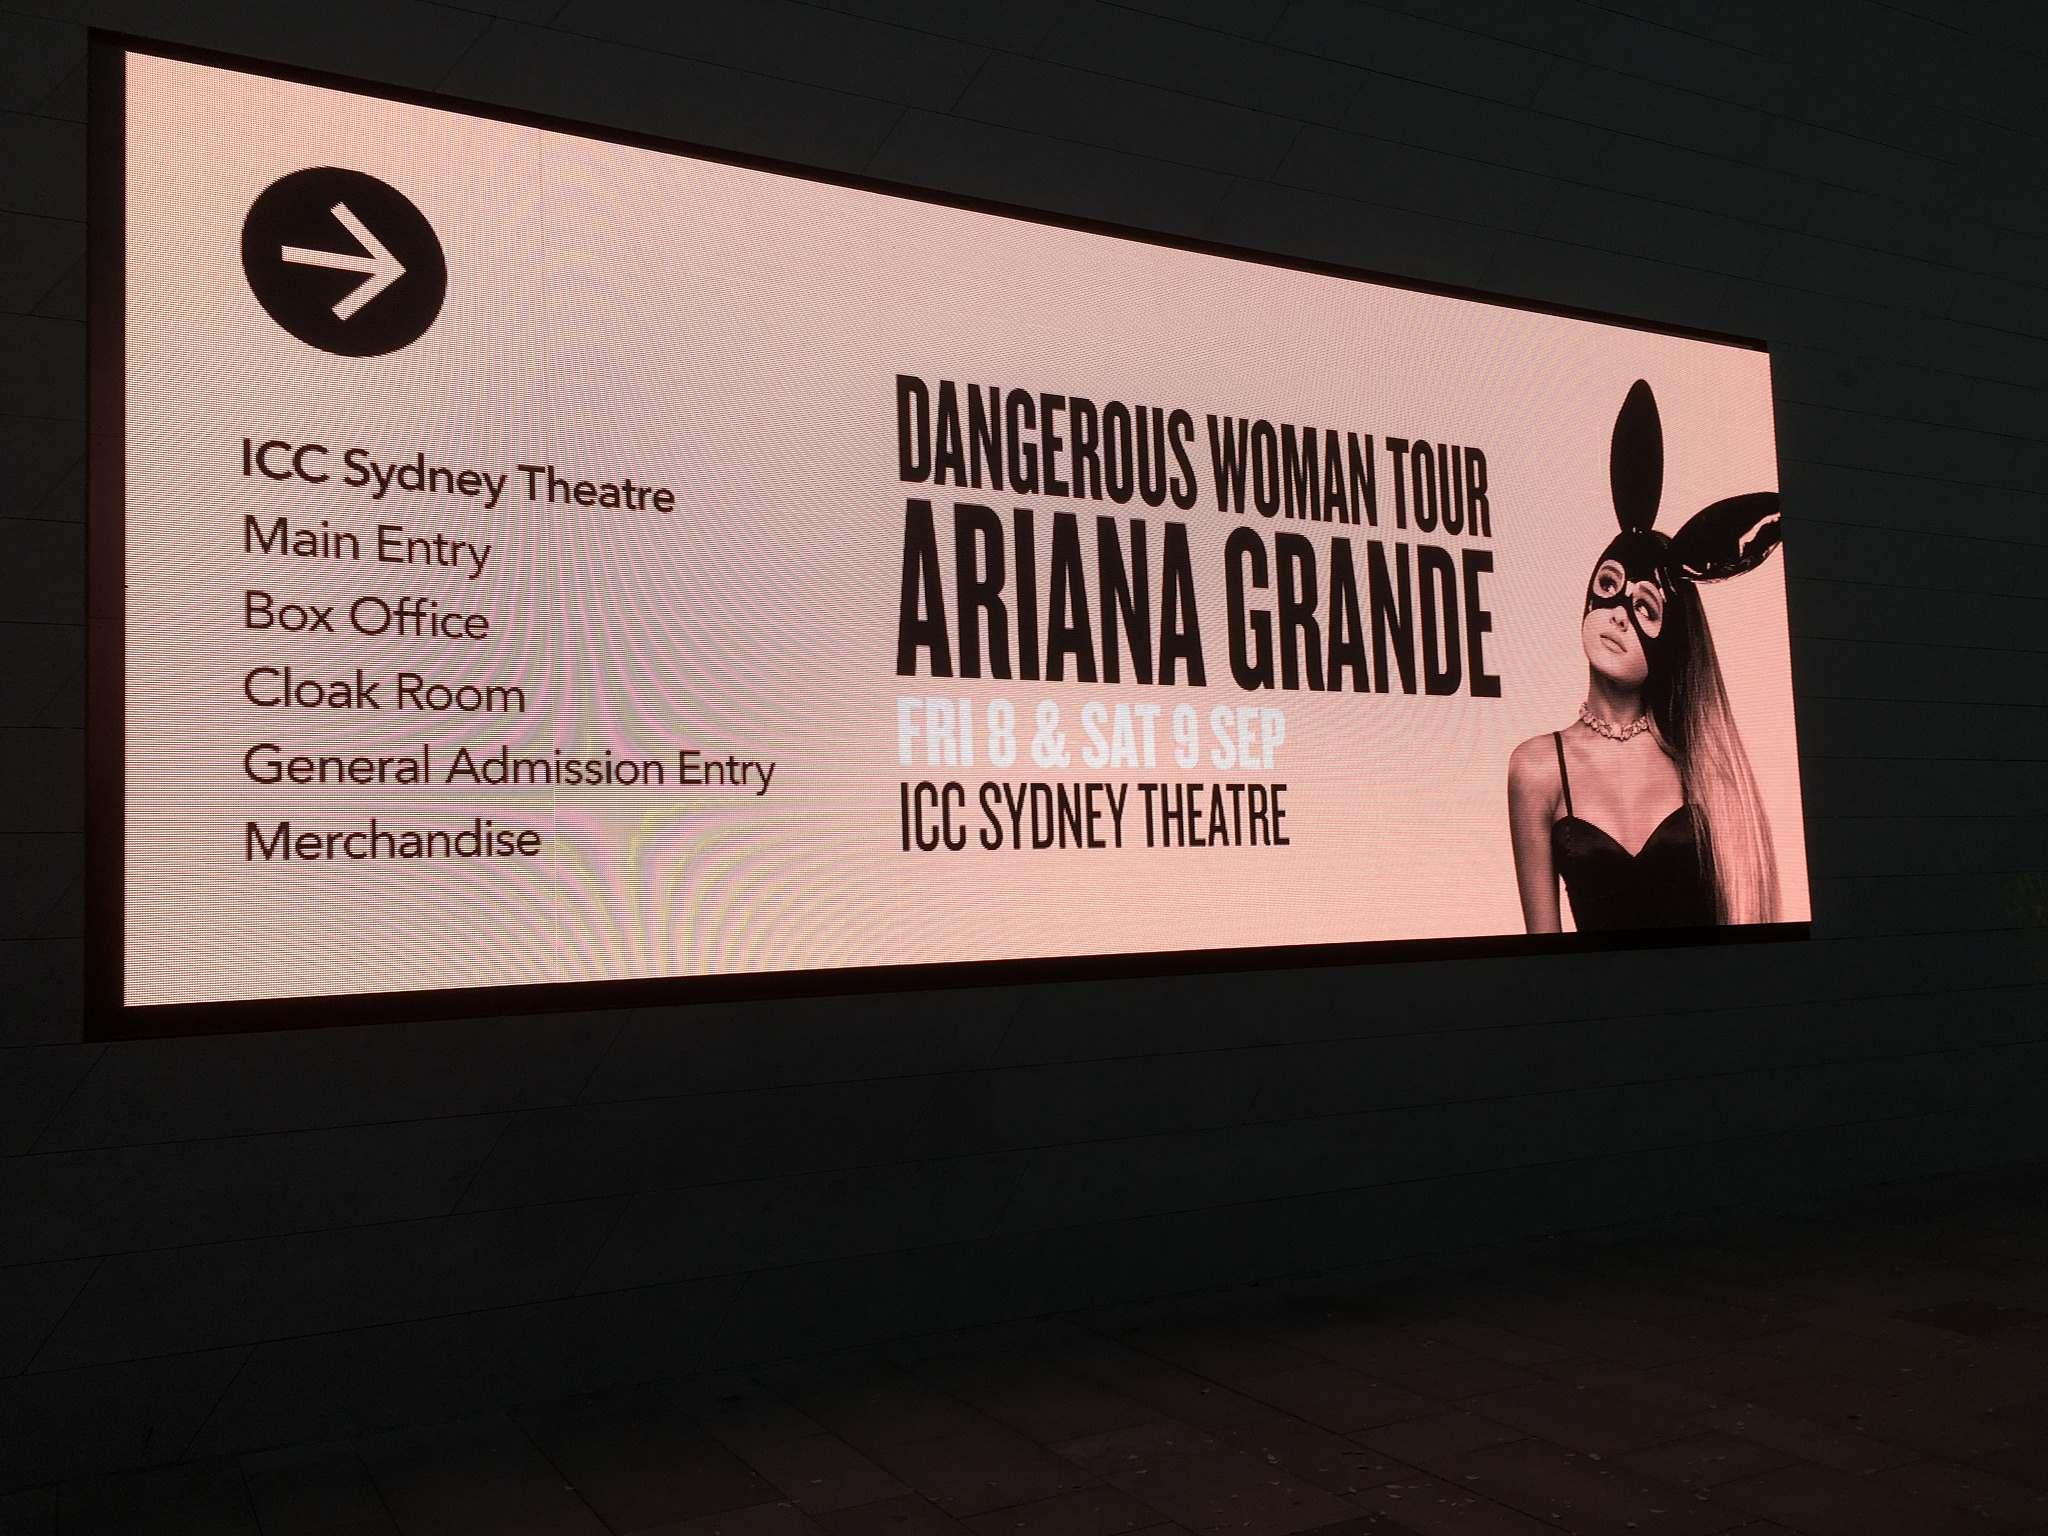 Ariana grande tour dates in Sydney